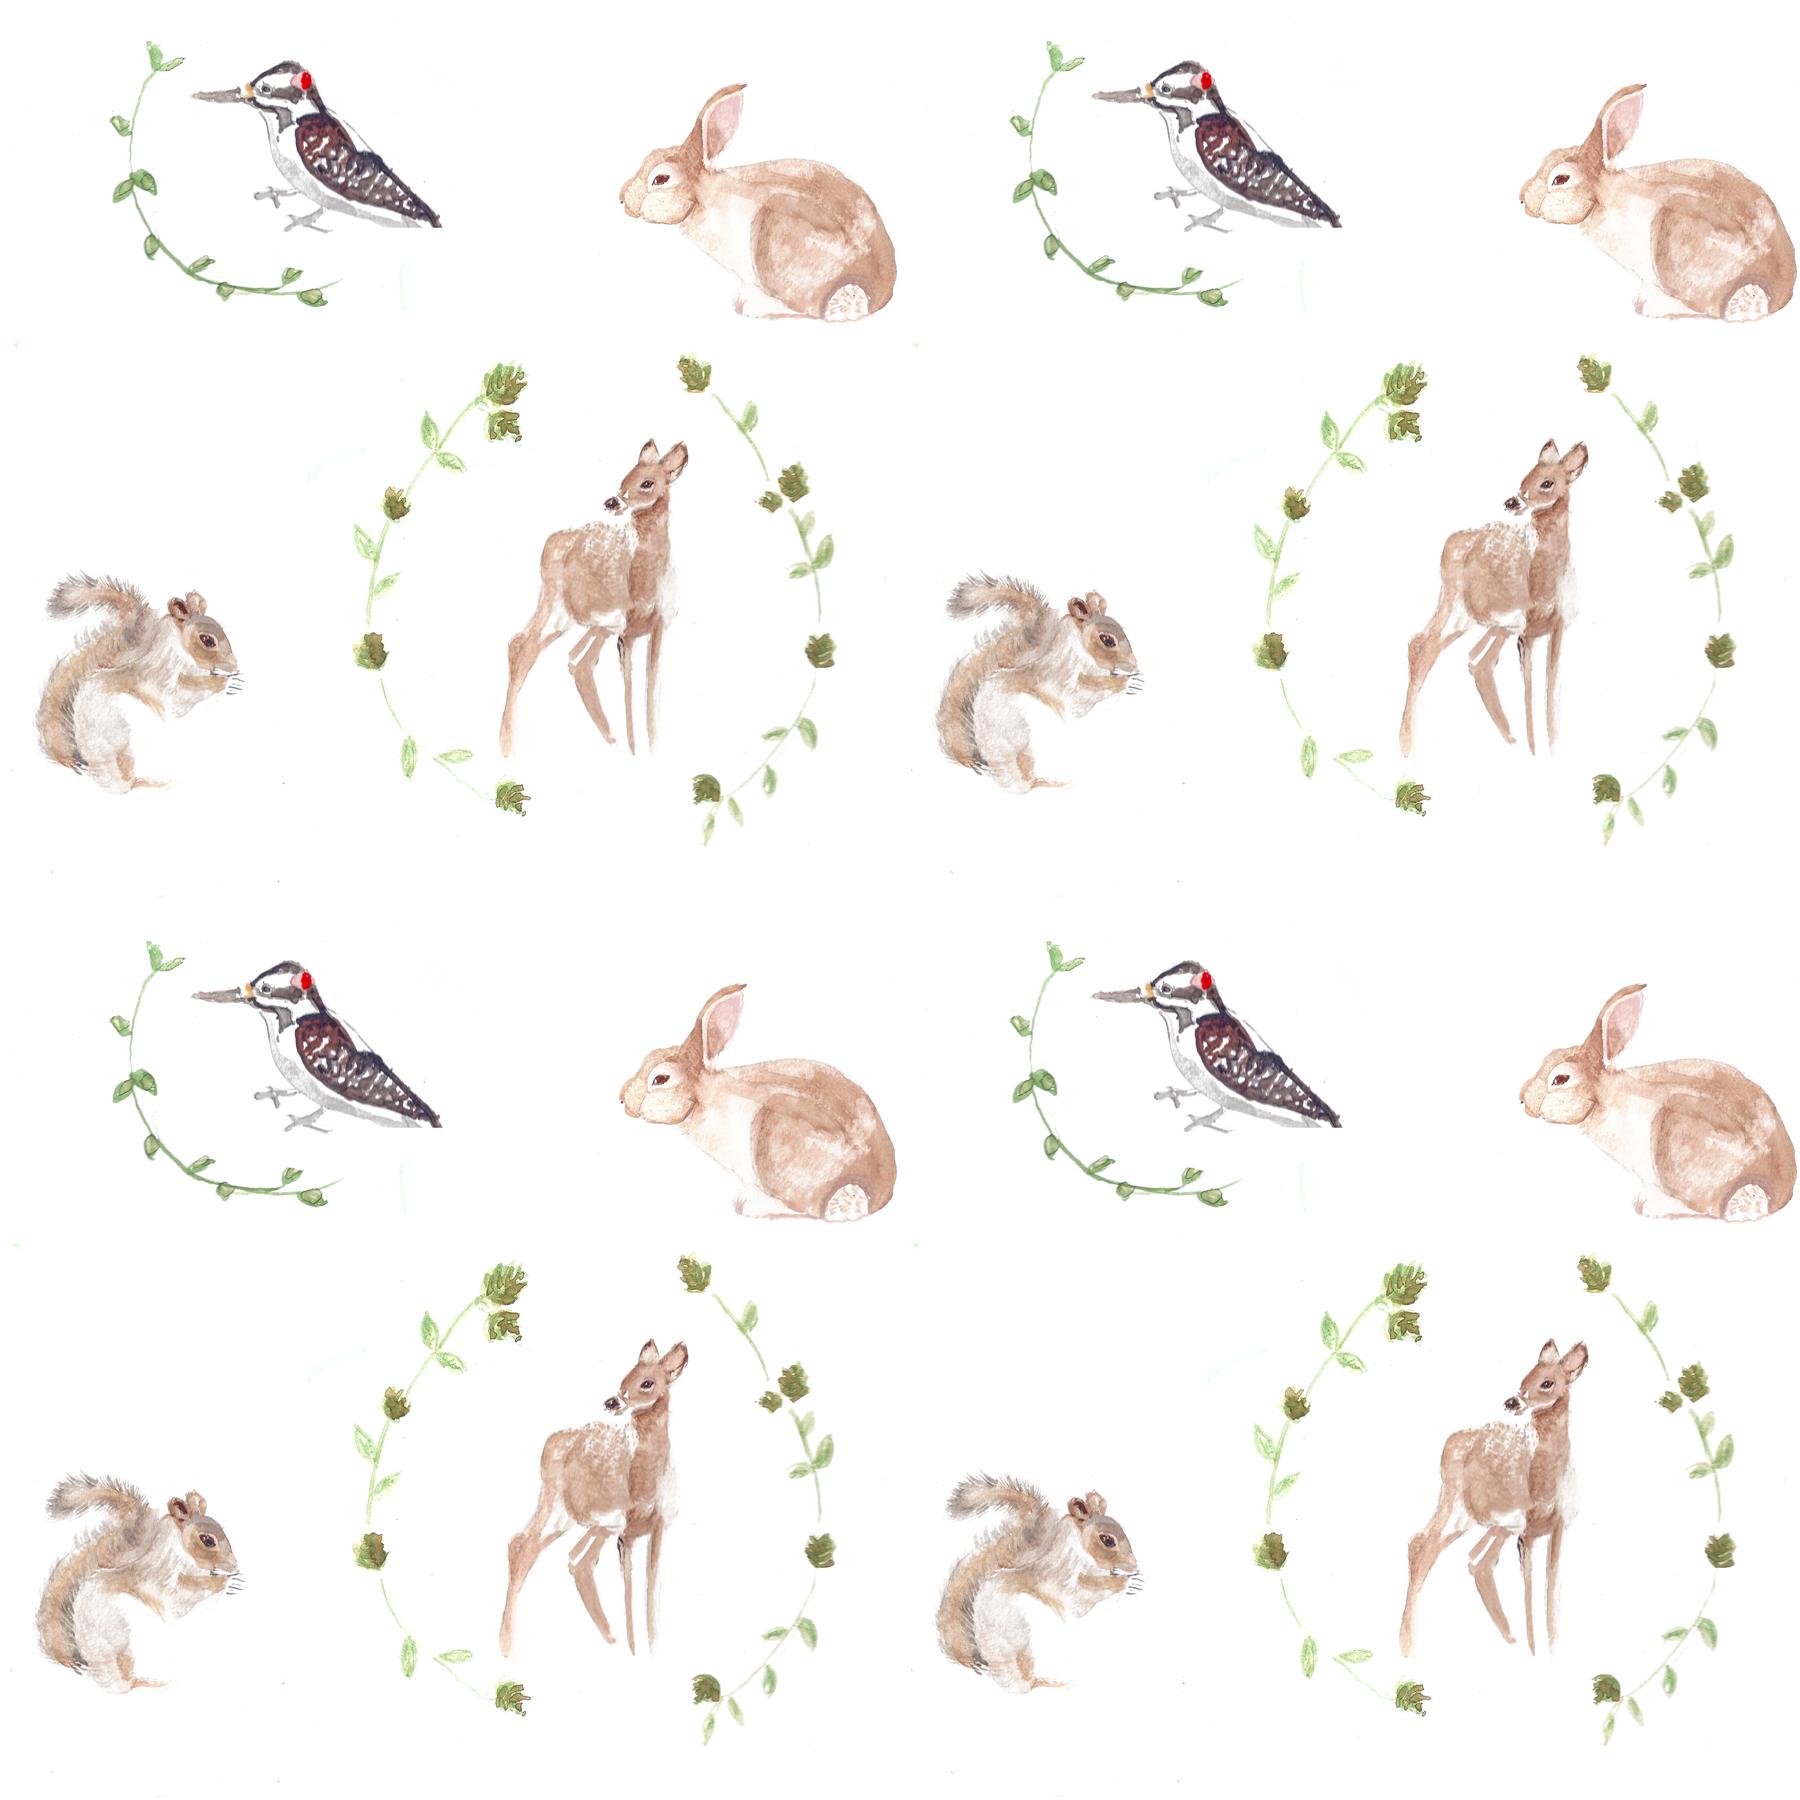 1800x1800 Animal Danielle Elizabeth Malin Design Illustration